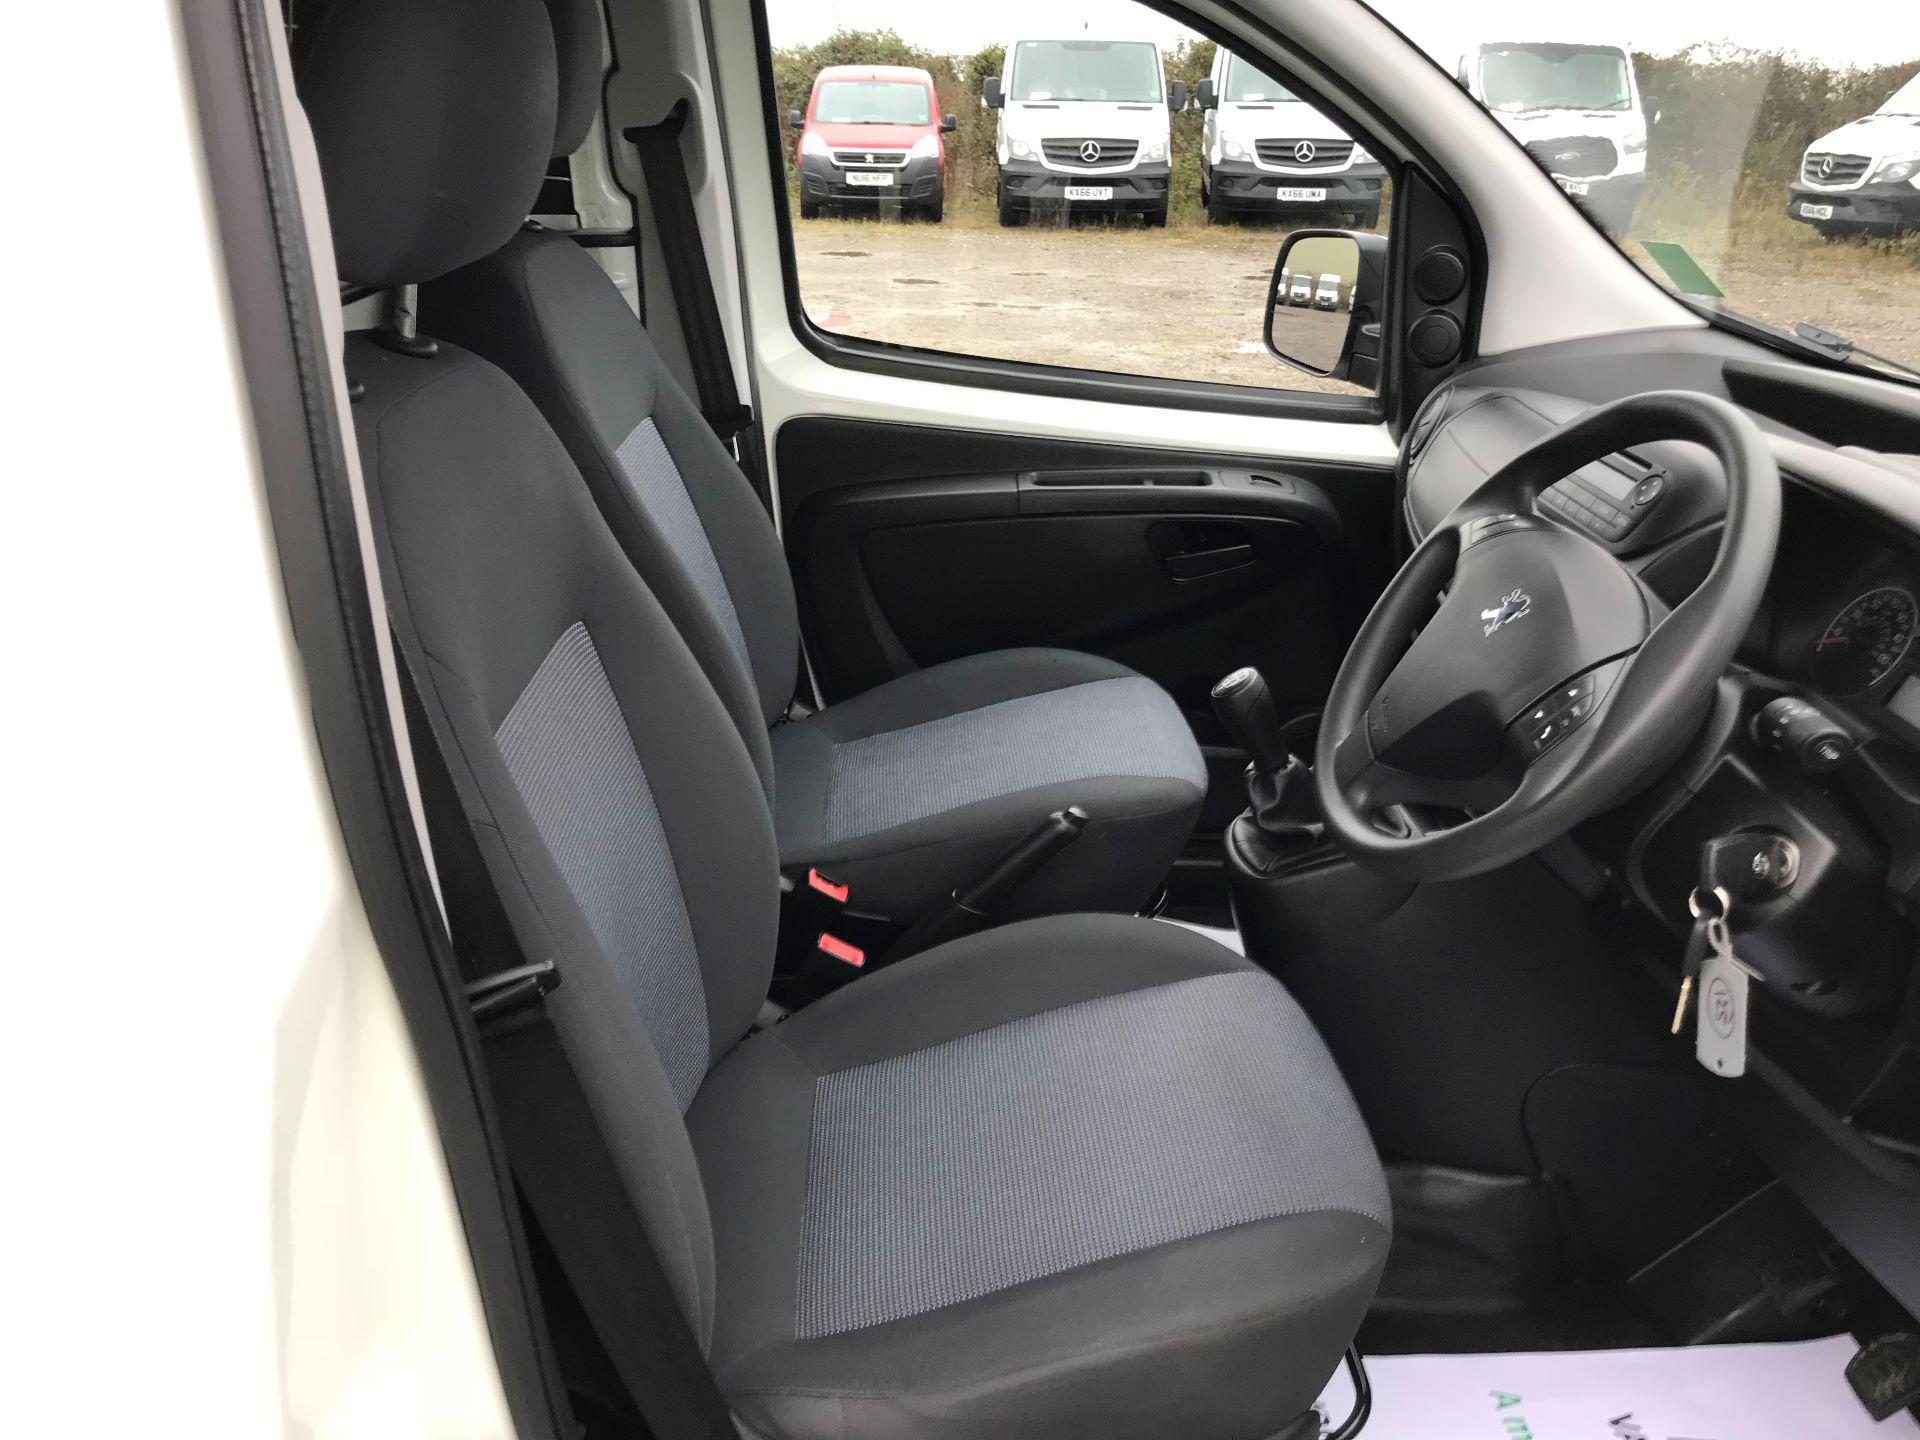 2016 Peugeot Bipper 1.3 HDI 75 S PLUS PACK NON S/S EURO 5 (NU16DLJ) Image 16